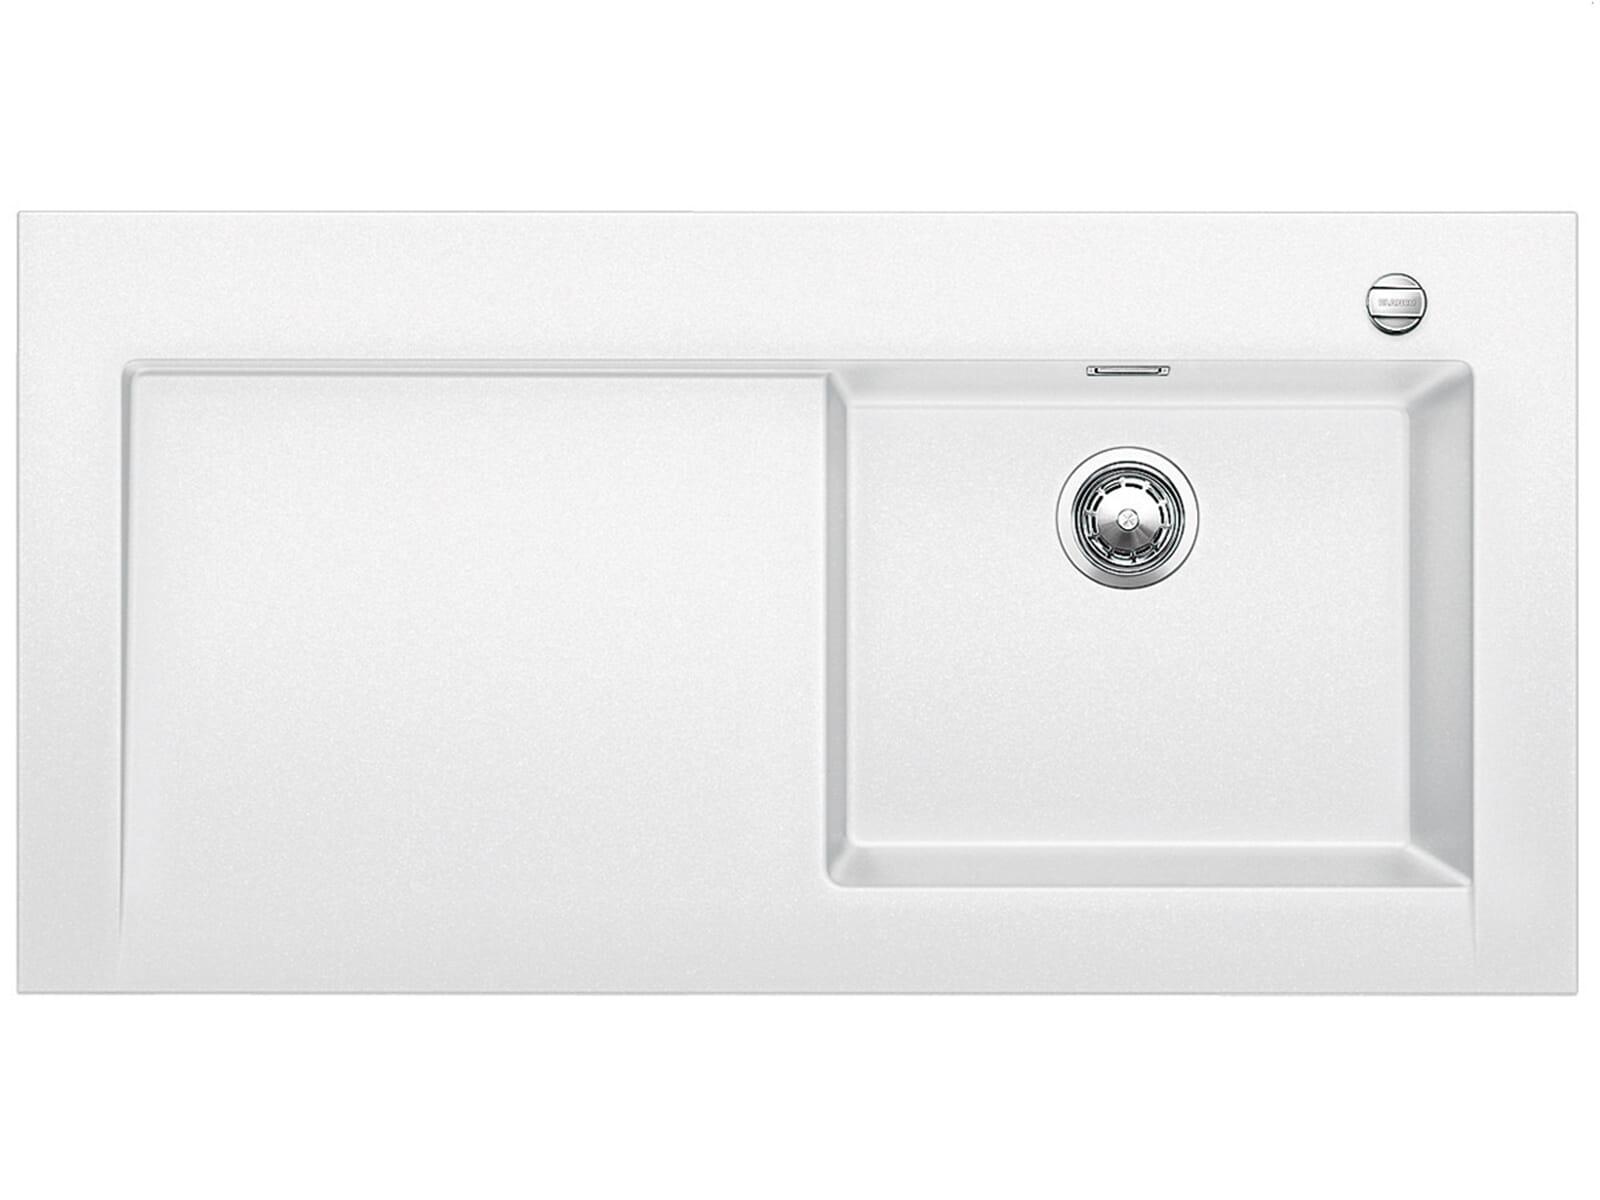 blanco modex m 60 wei granit sp le einbau auflage modul 60er us ebay. Black Bedroom Furniture Sets. Home Design Ideas